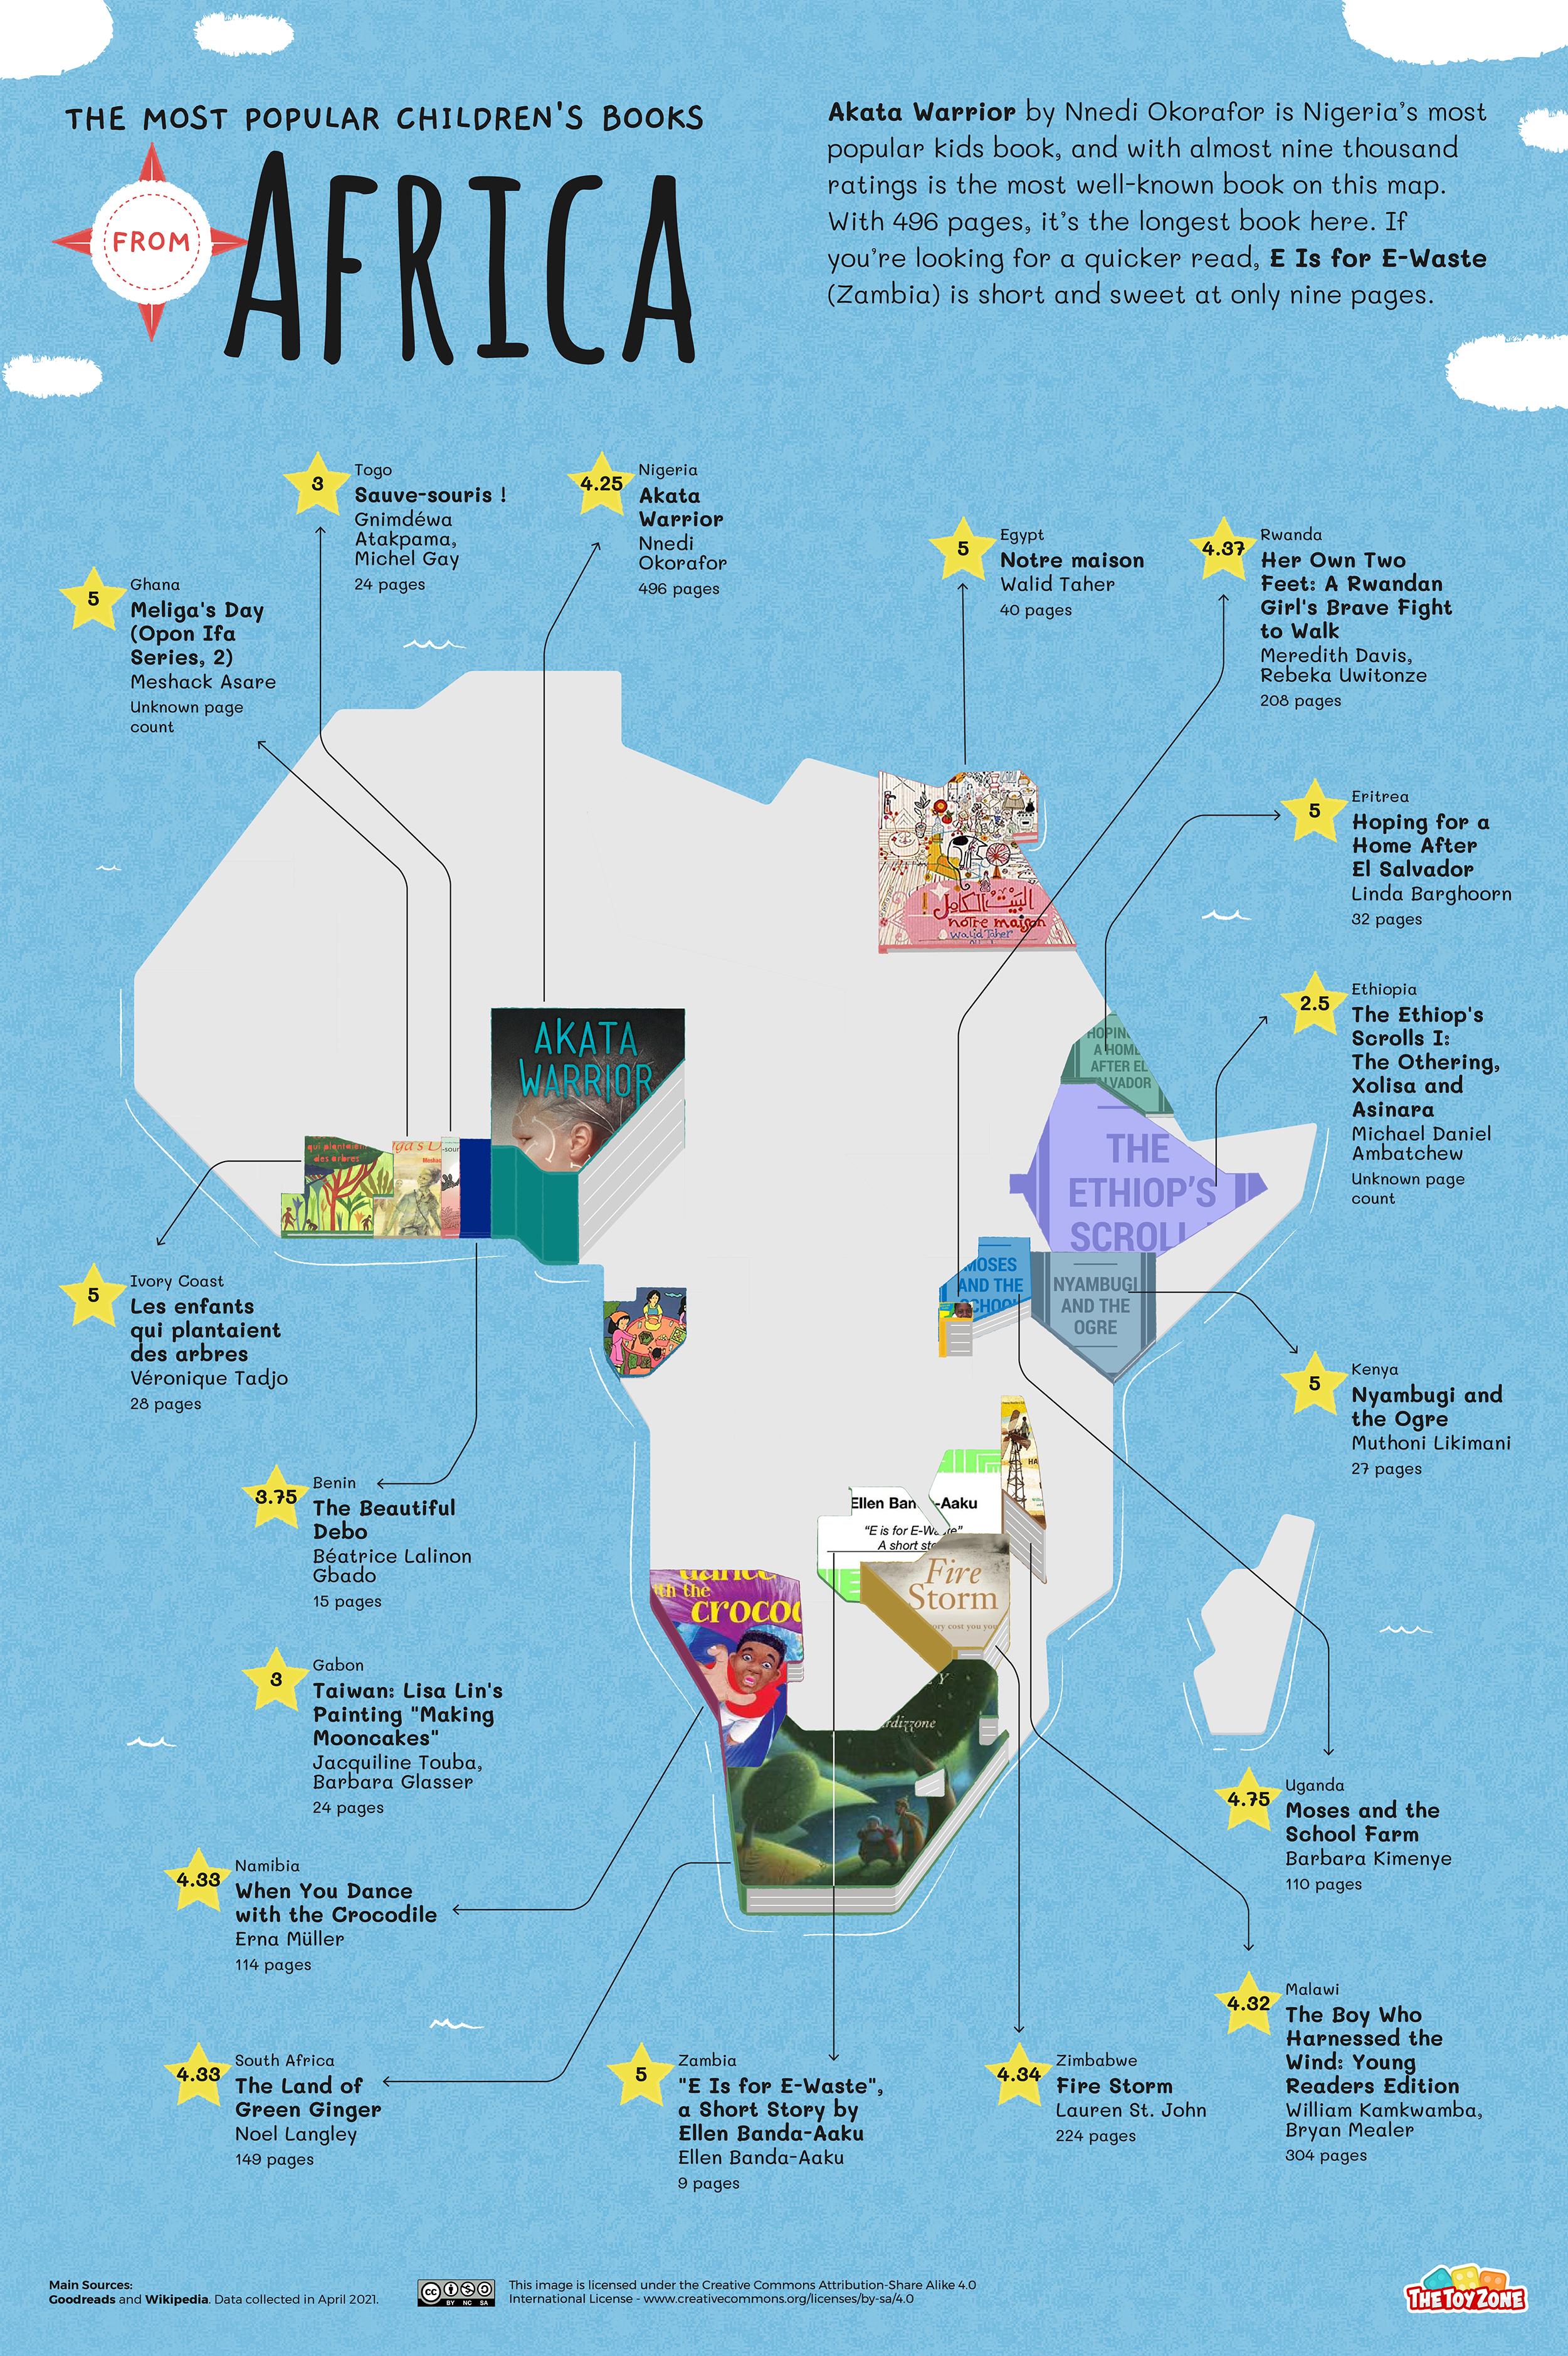 Most popular African children's books map